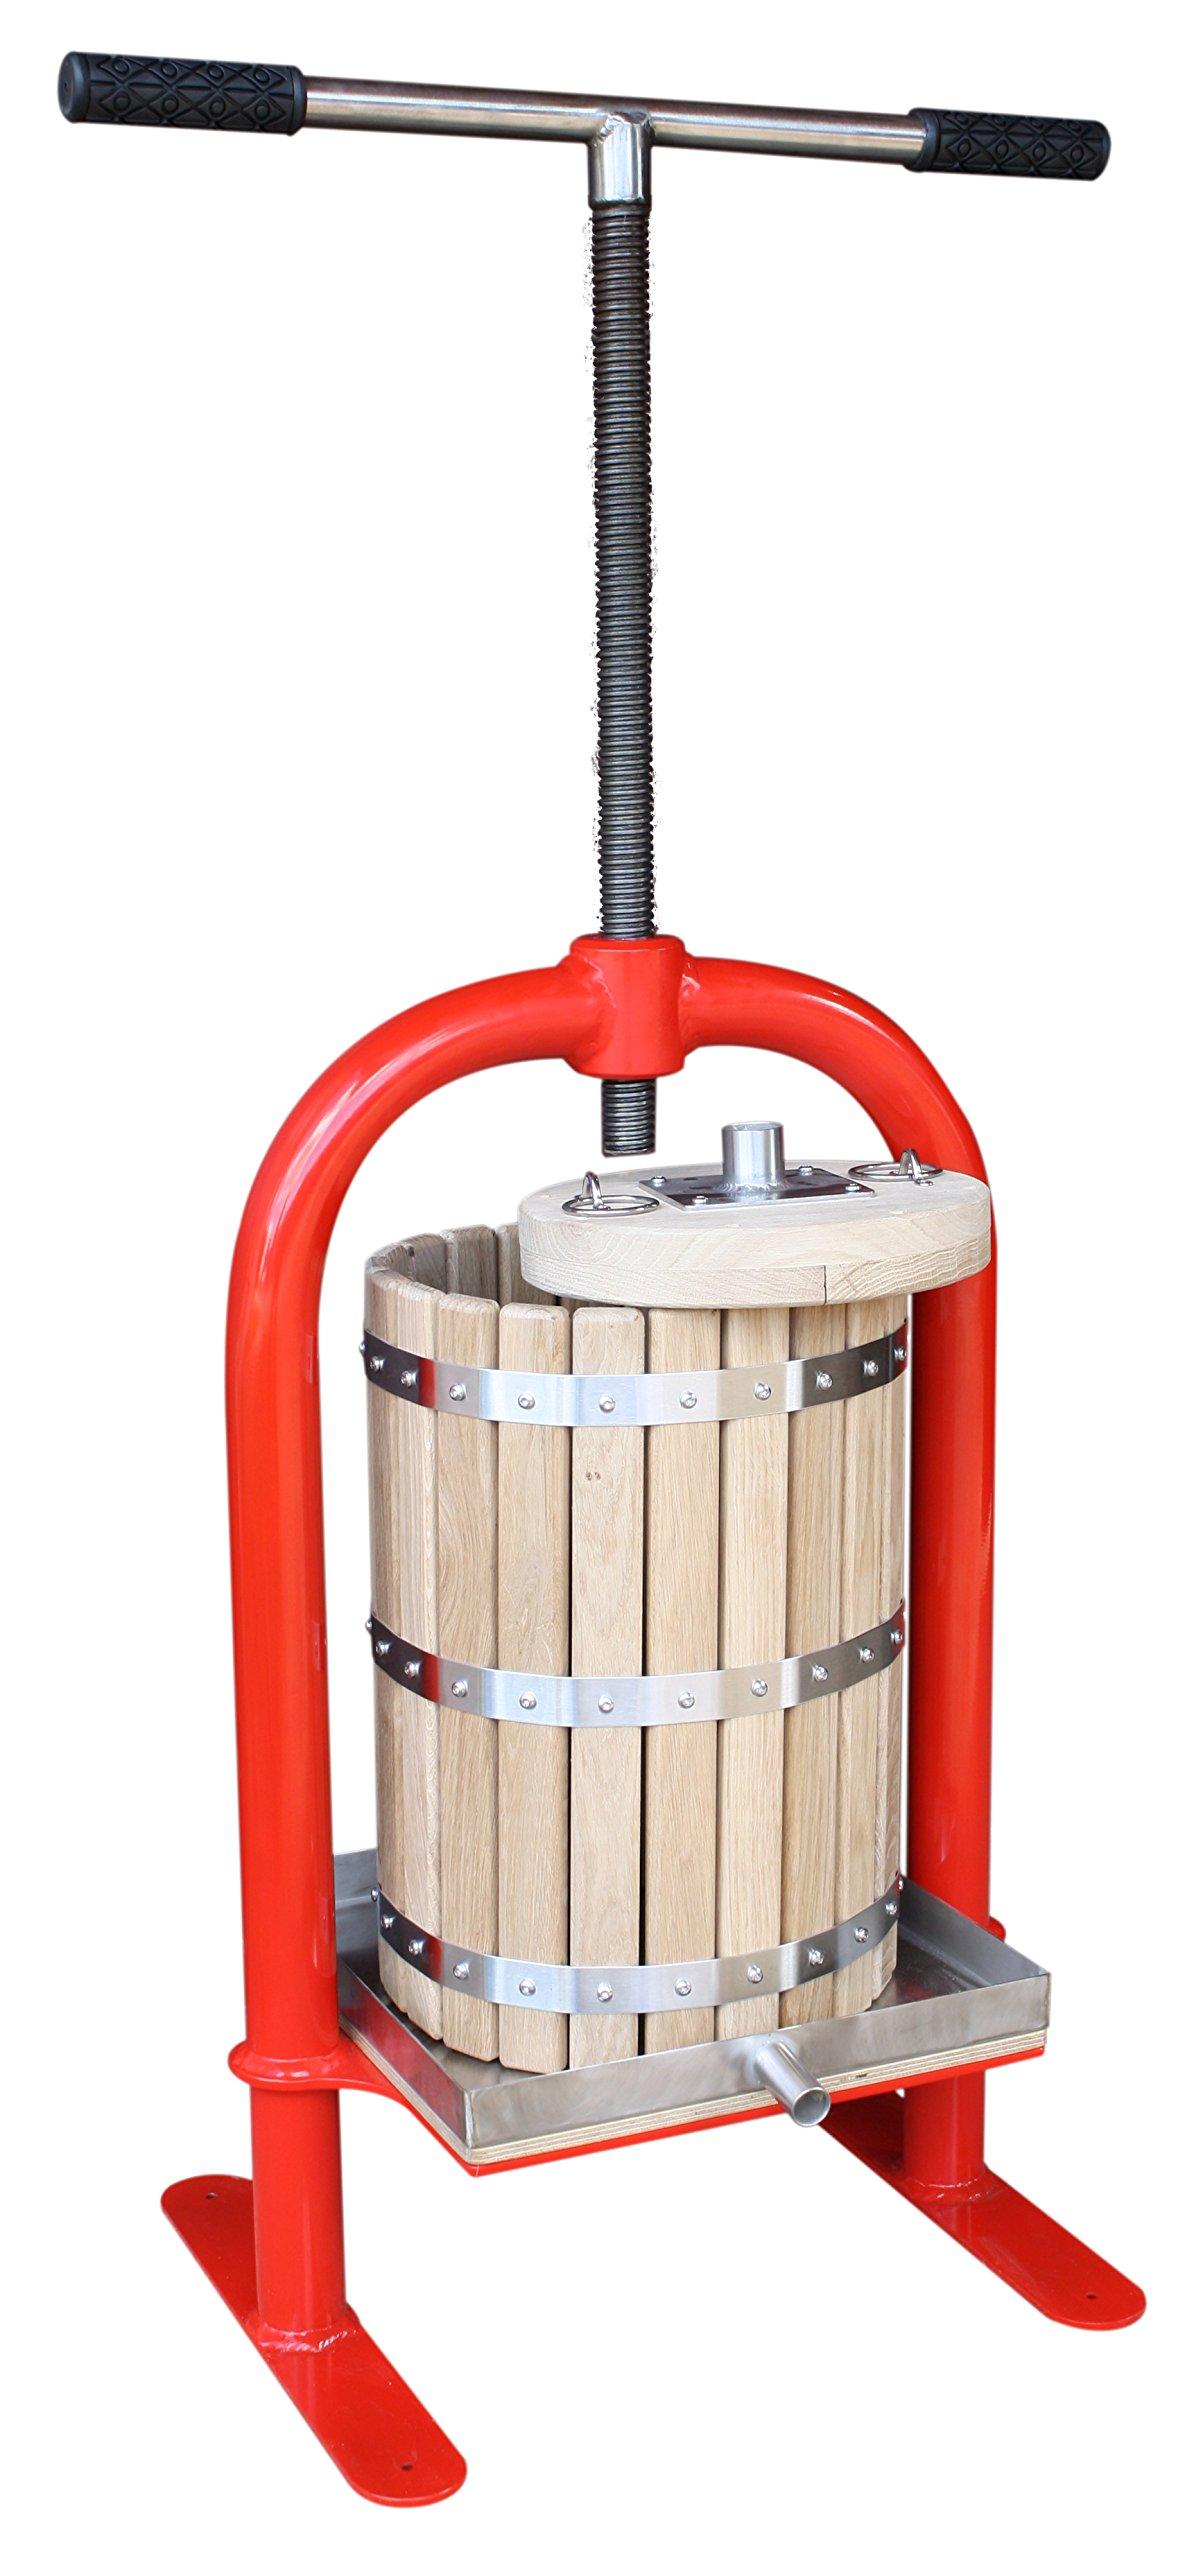 Screw press VP-20 - juicer for apples, grapes, berries, fruits, wine, cider